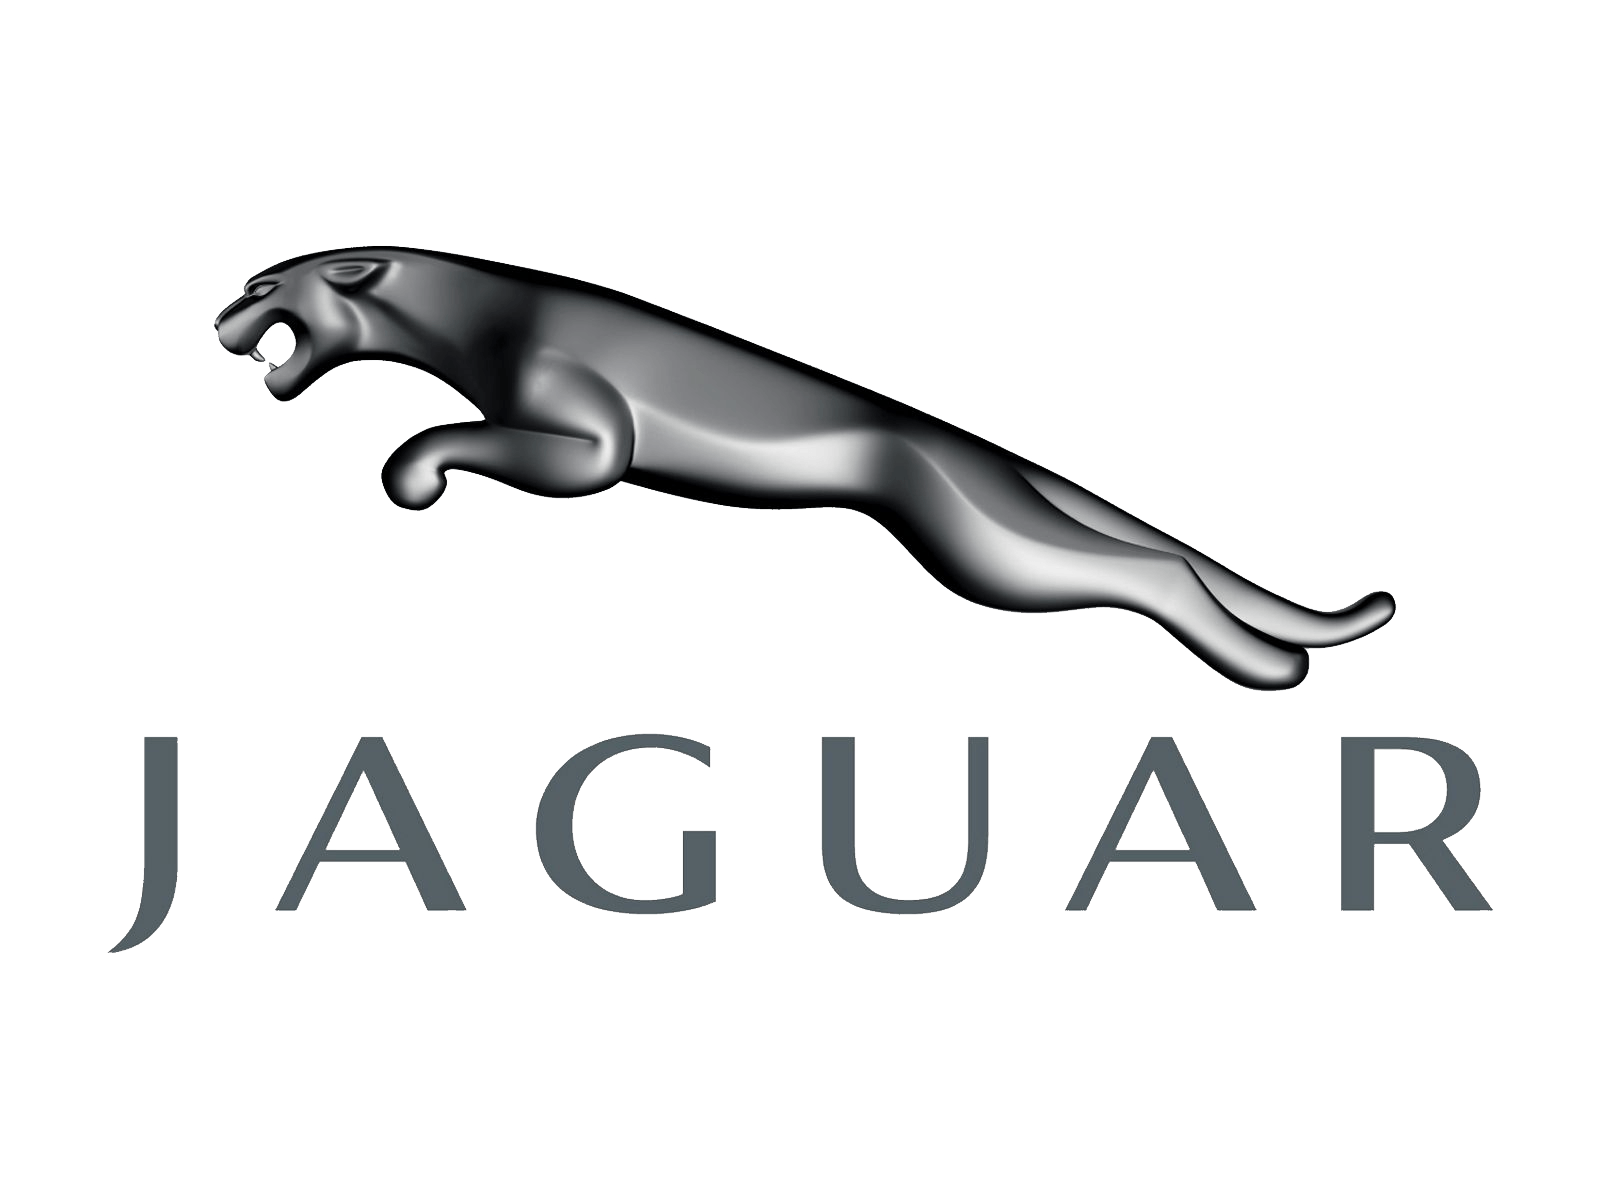 Download PNG image - Jaguar C